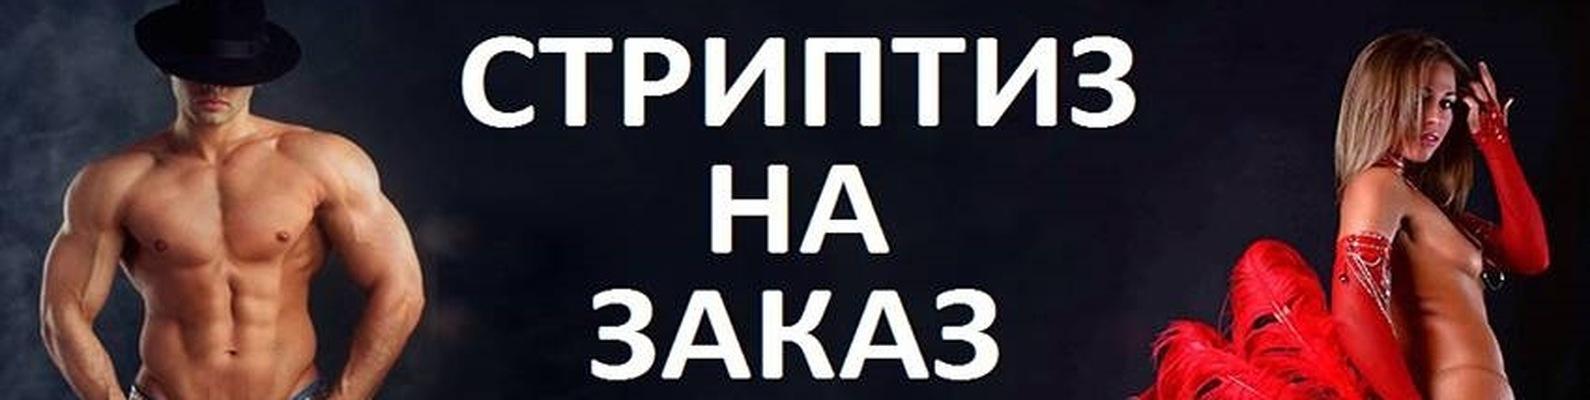 Спутники Сириус Амос Хотберд (Sirius Amos Hotbird